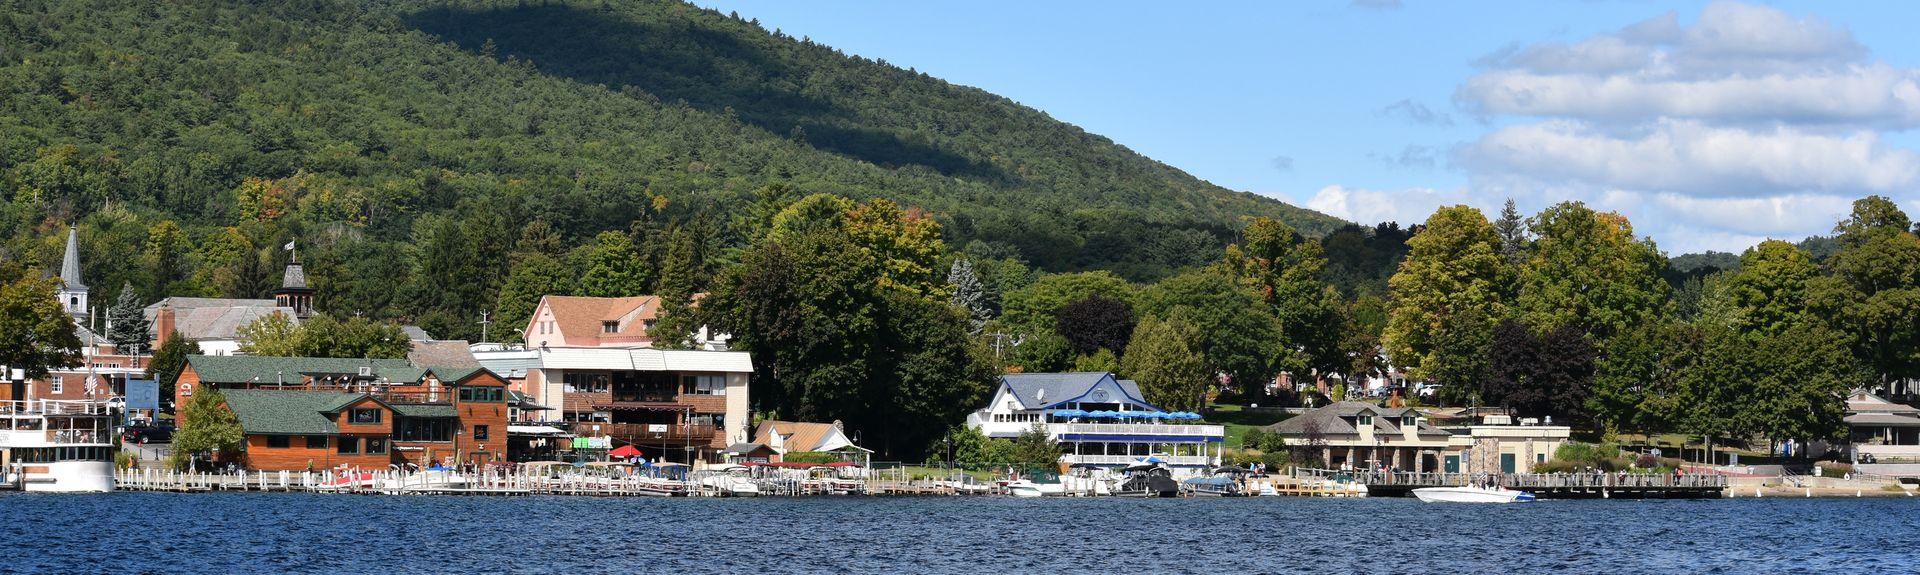 Saratoga Lake, NY, USA